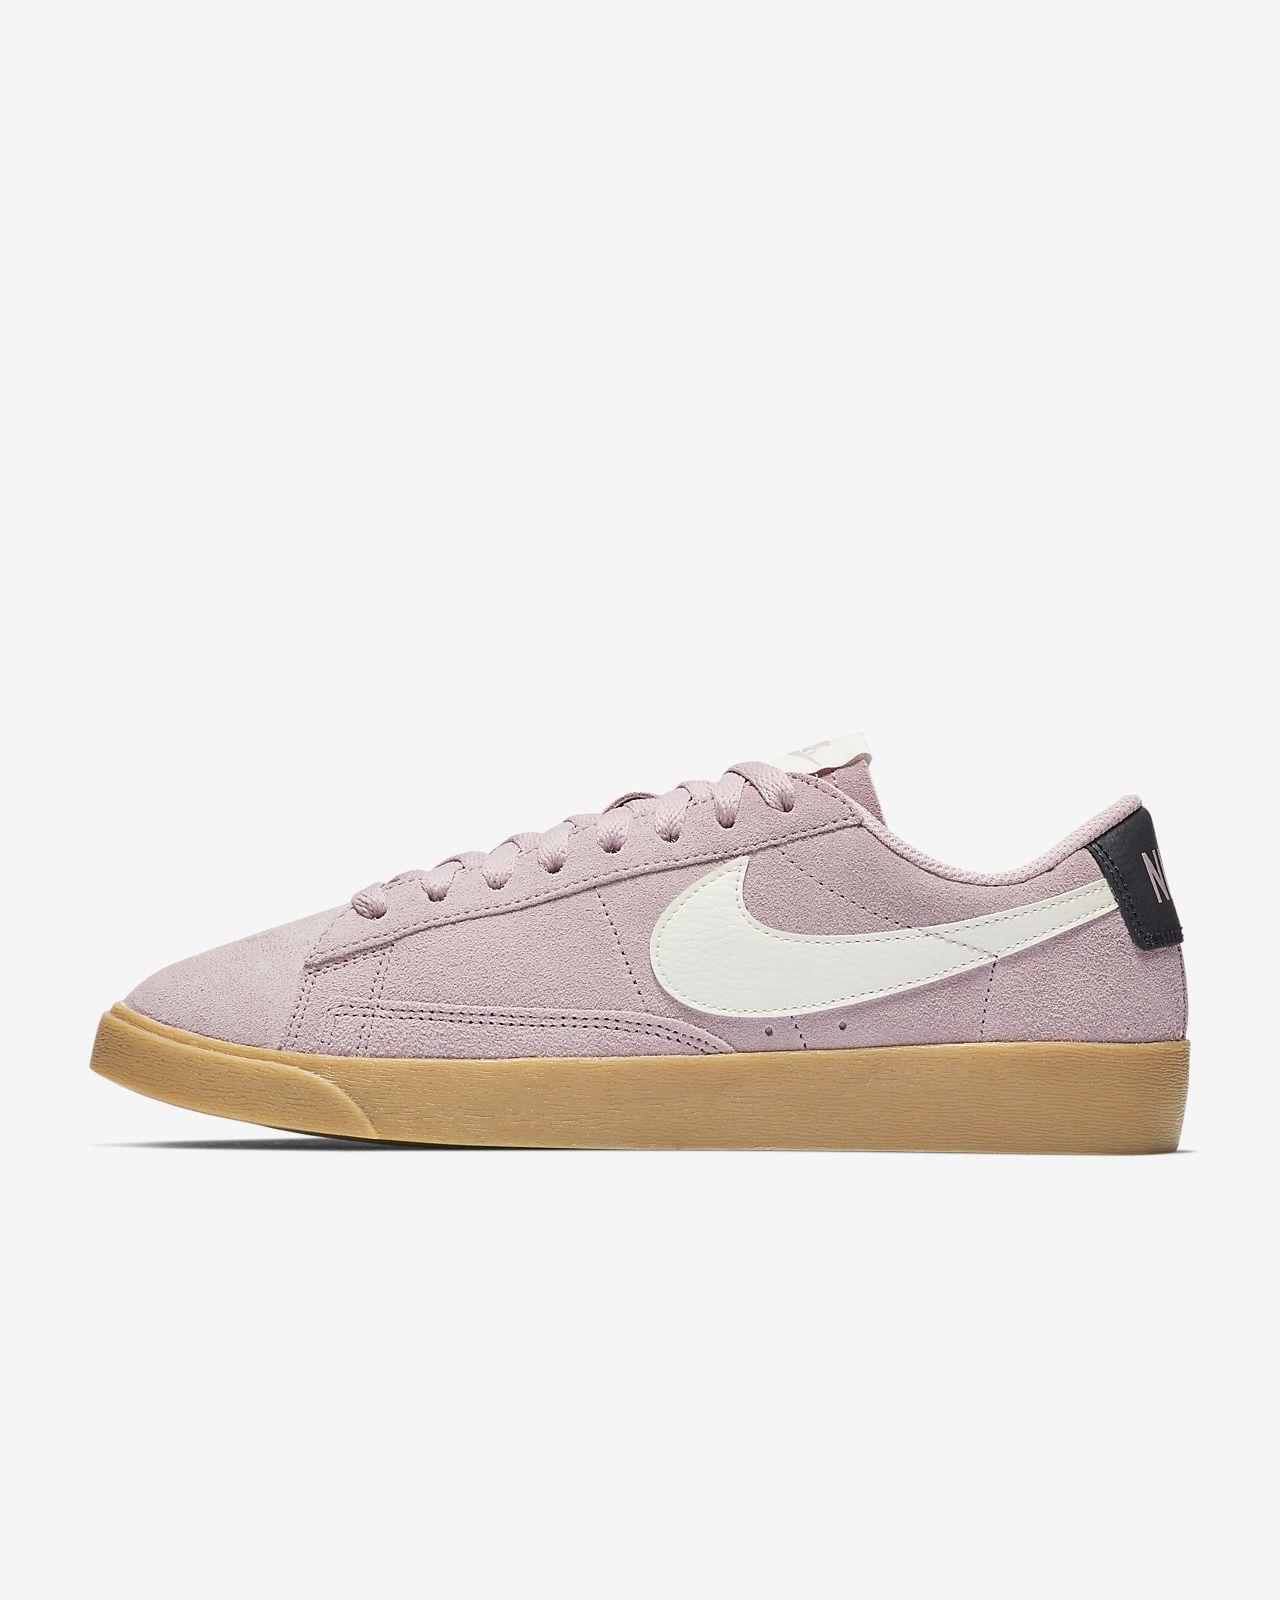 quality design 04d66 9c297 Nike Blazer Low Suede